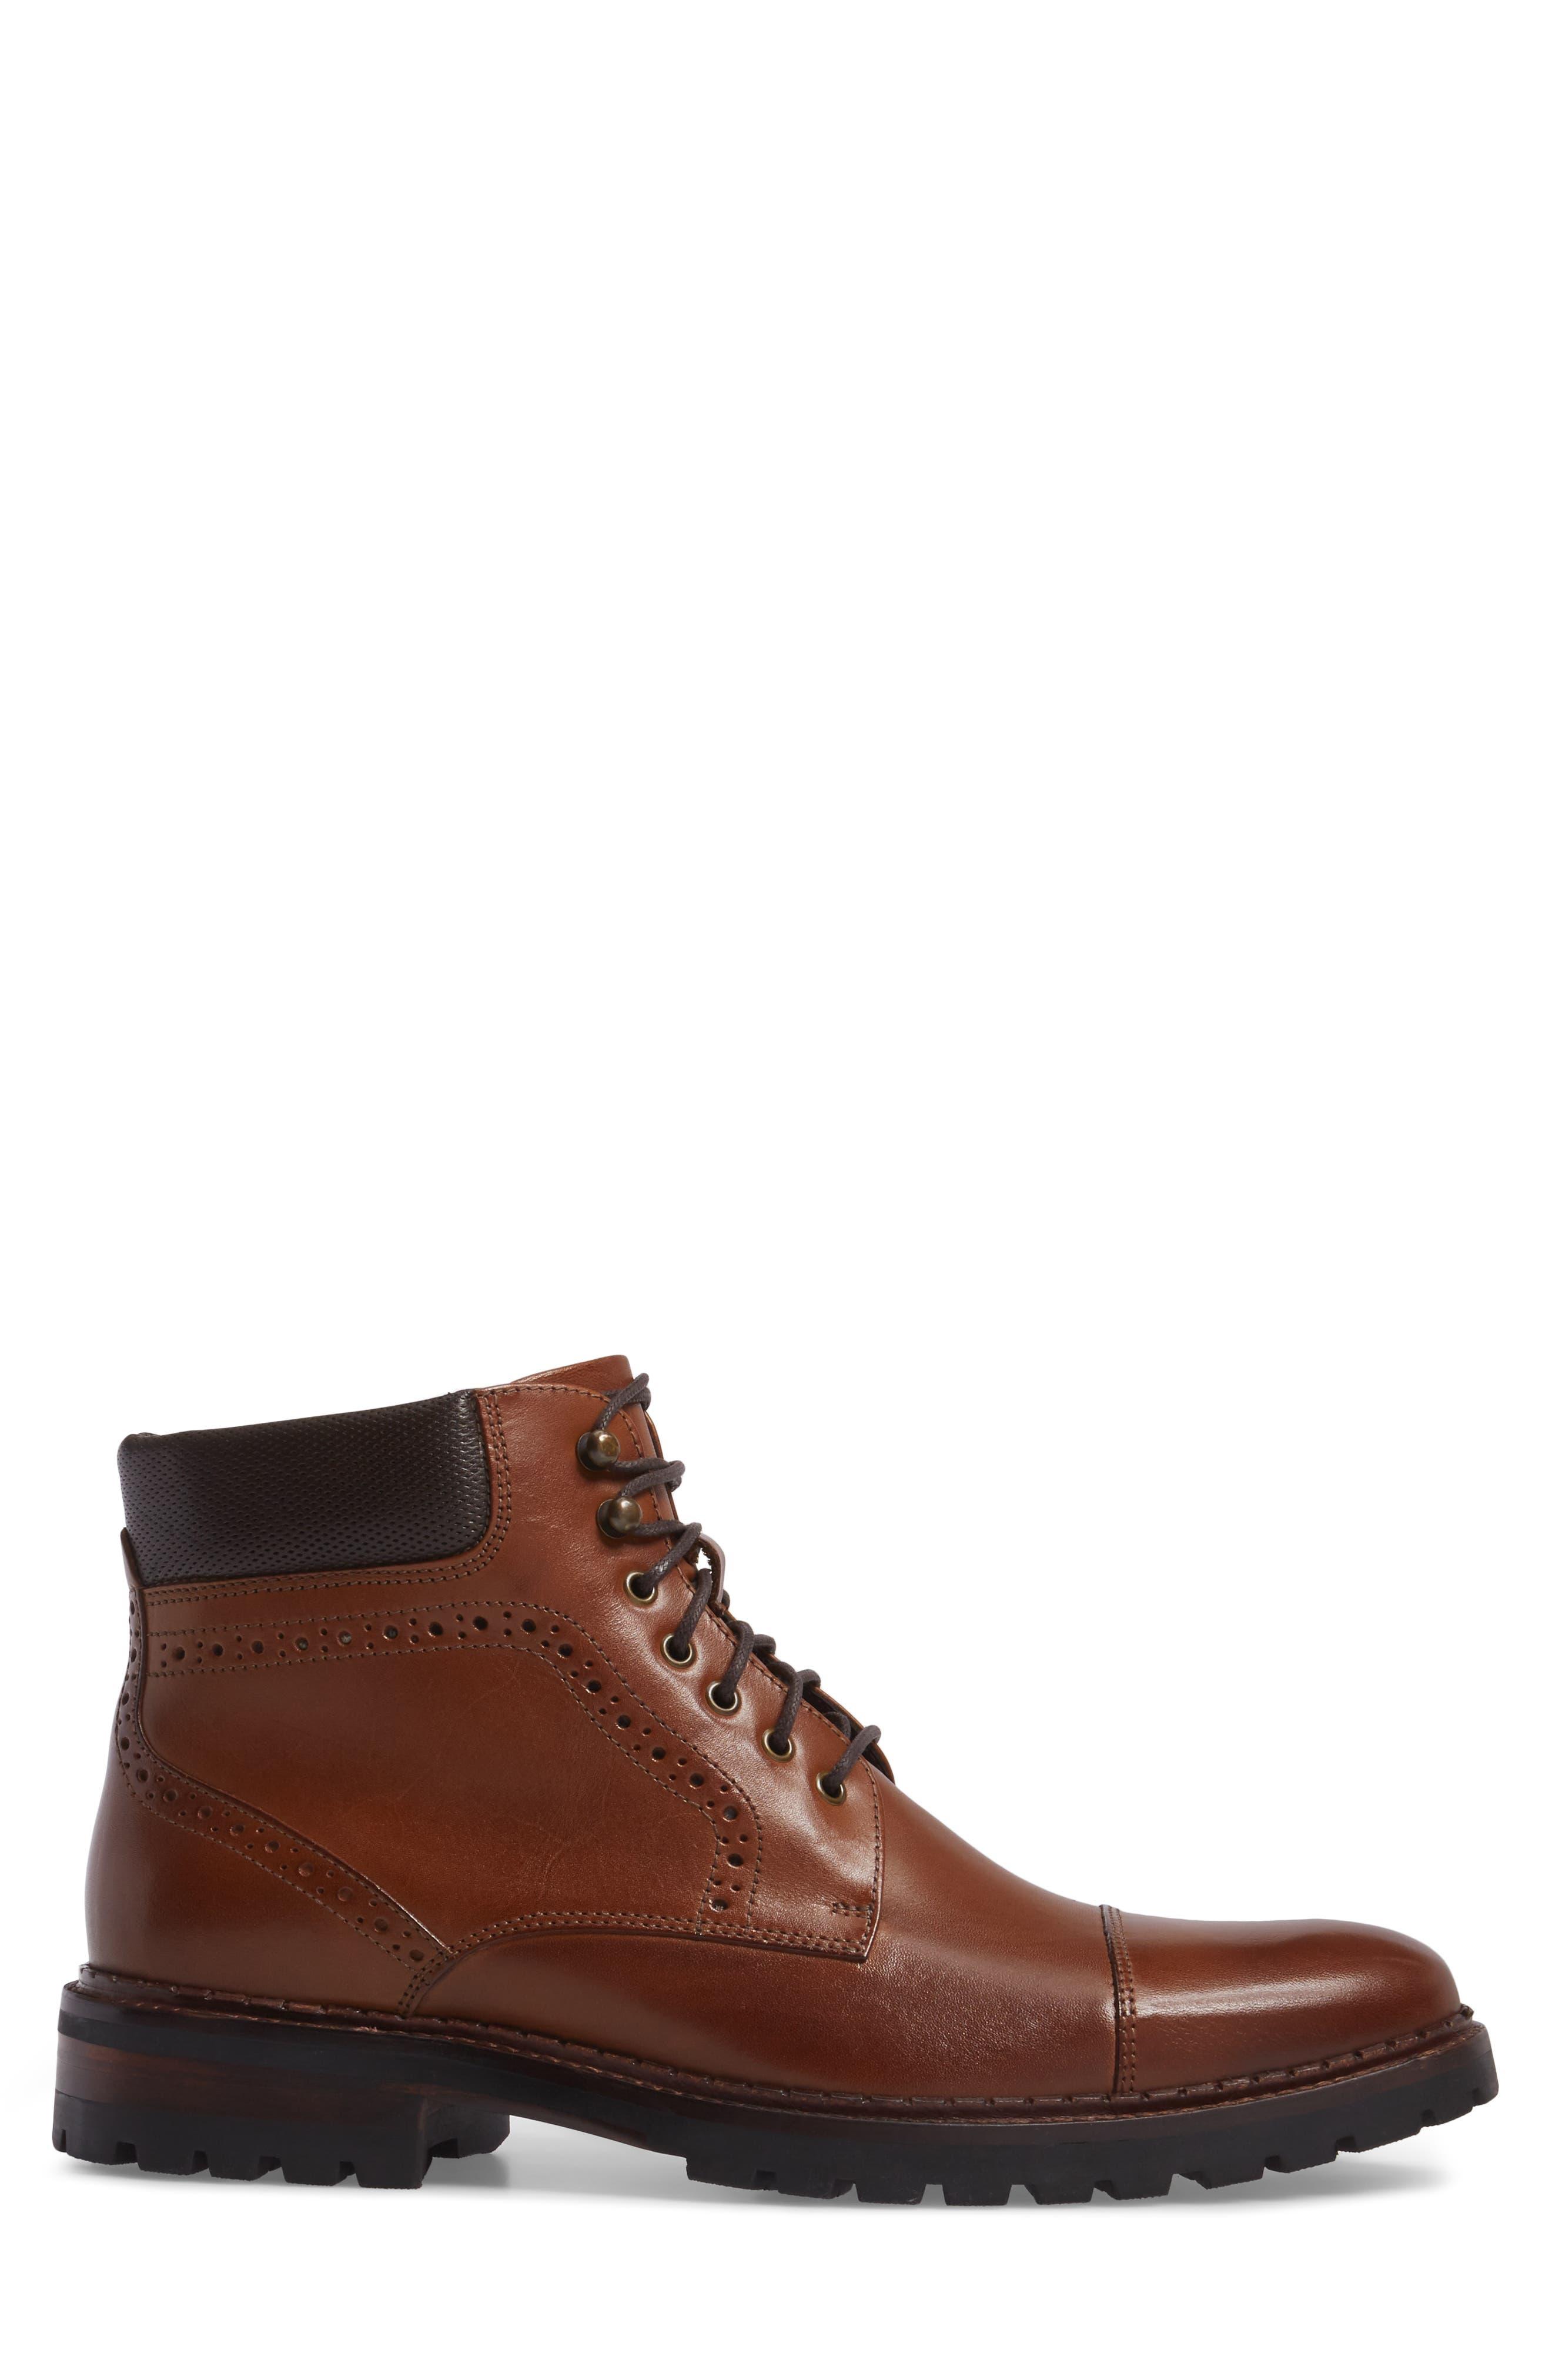 Jennings Cap Toe Boot,                             Alternate thumbnail 3, color,                             240